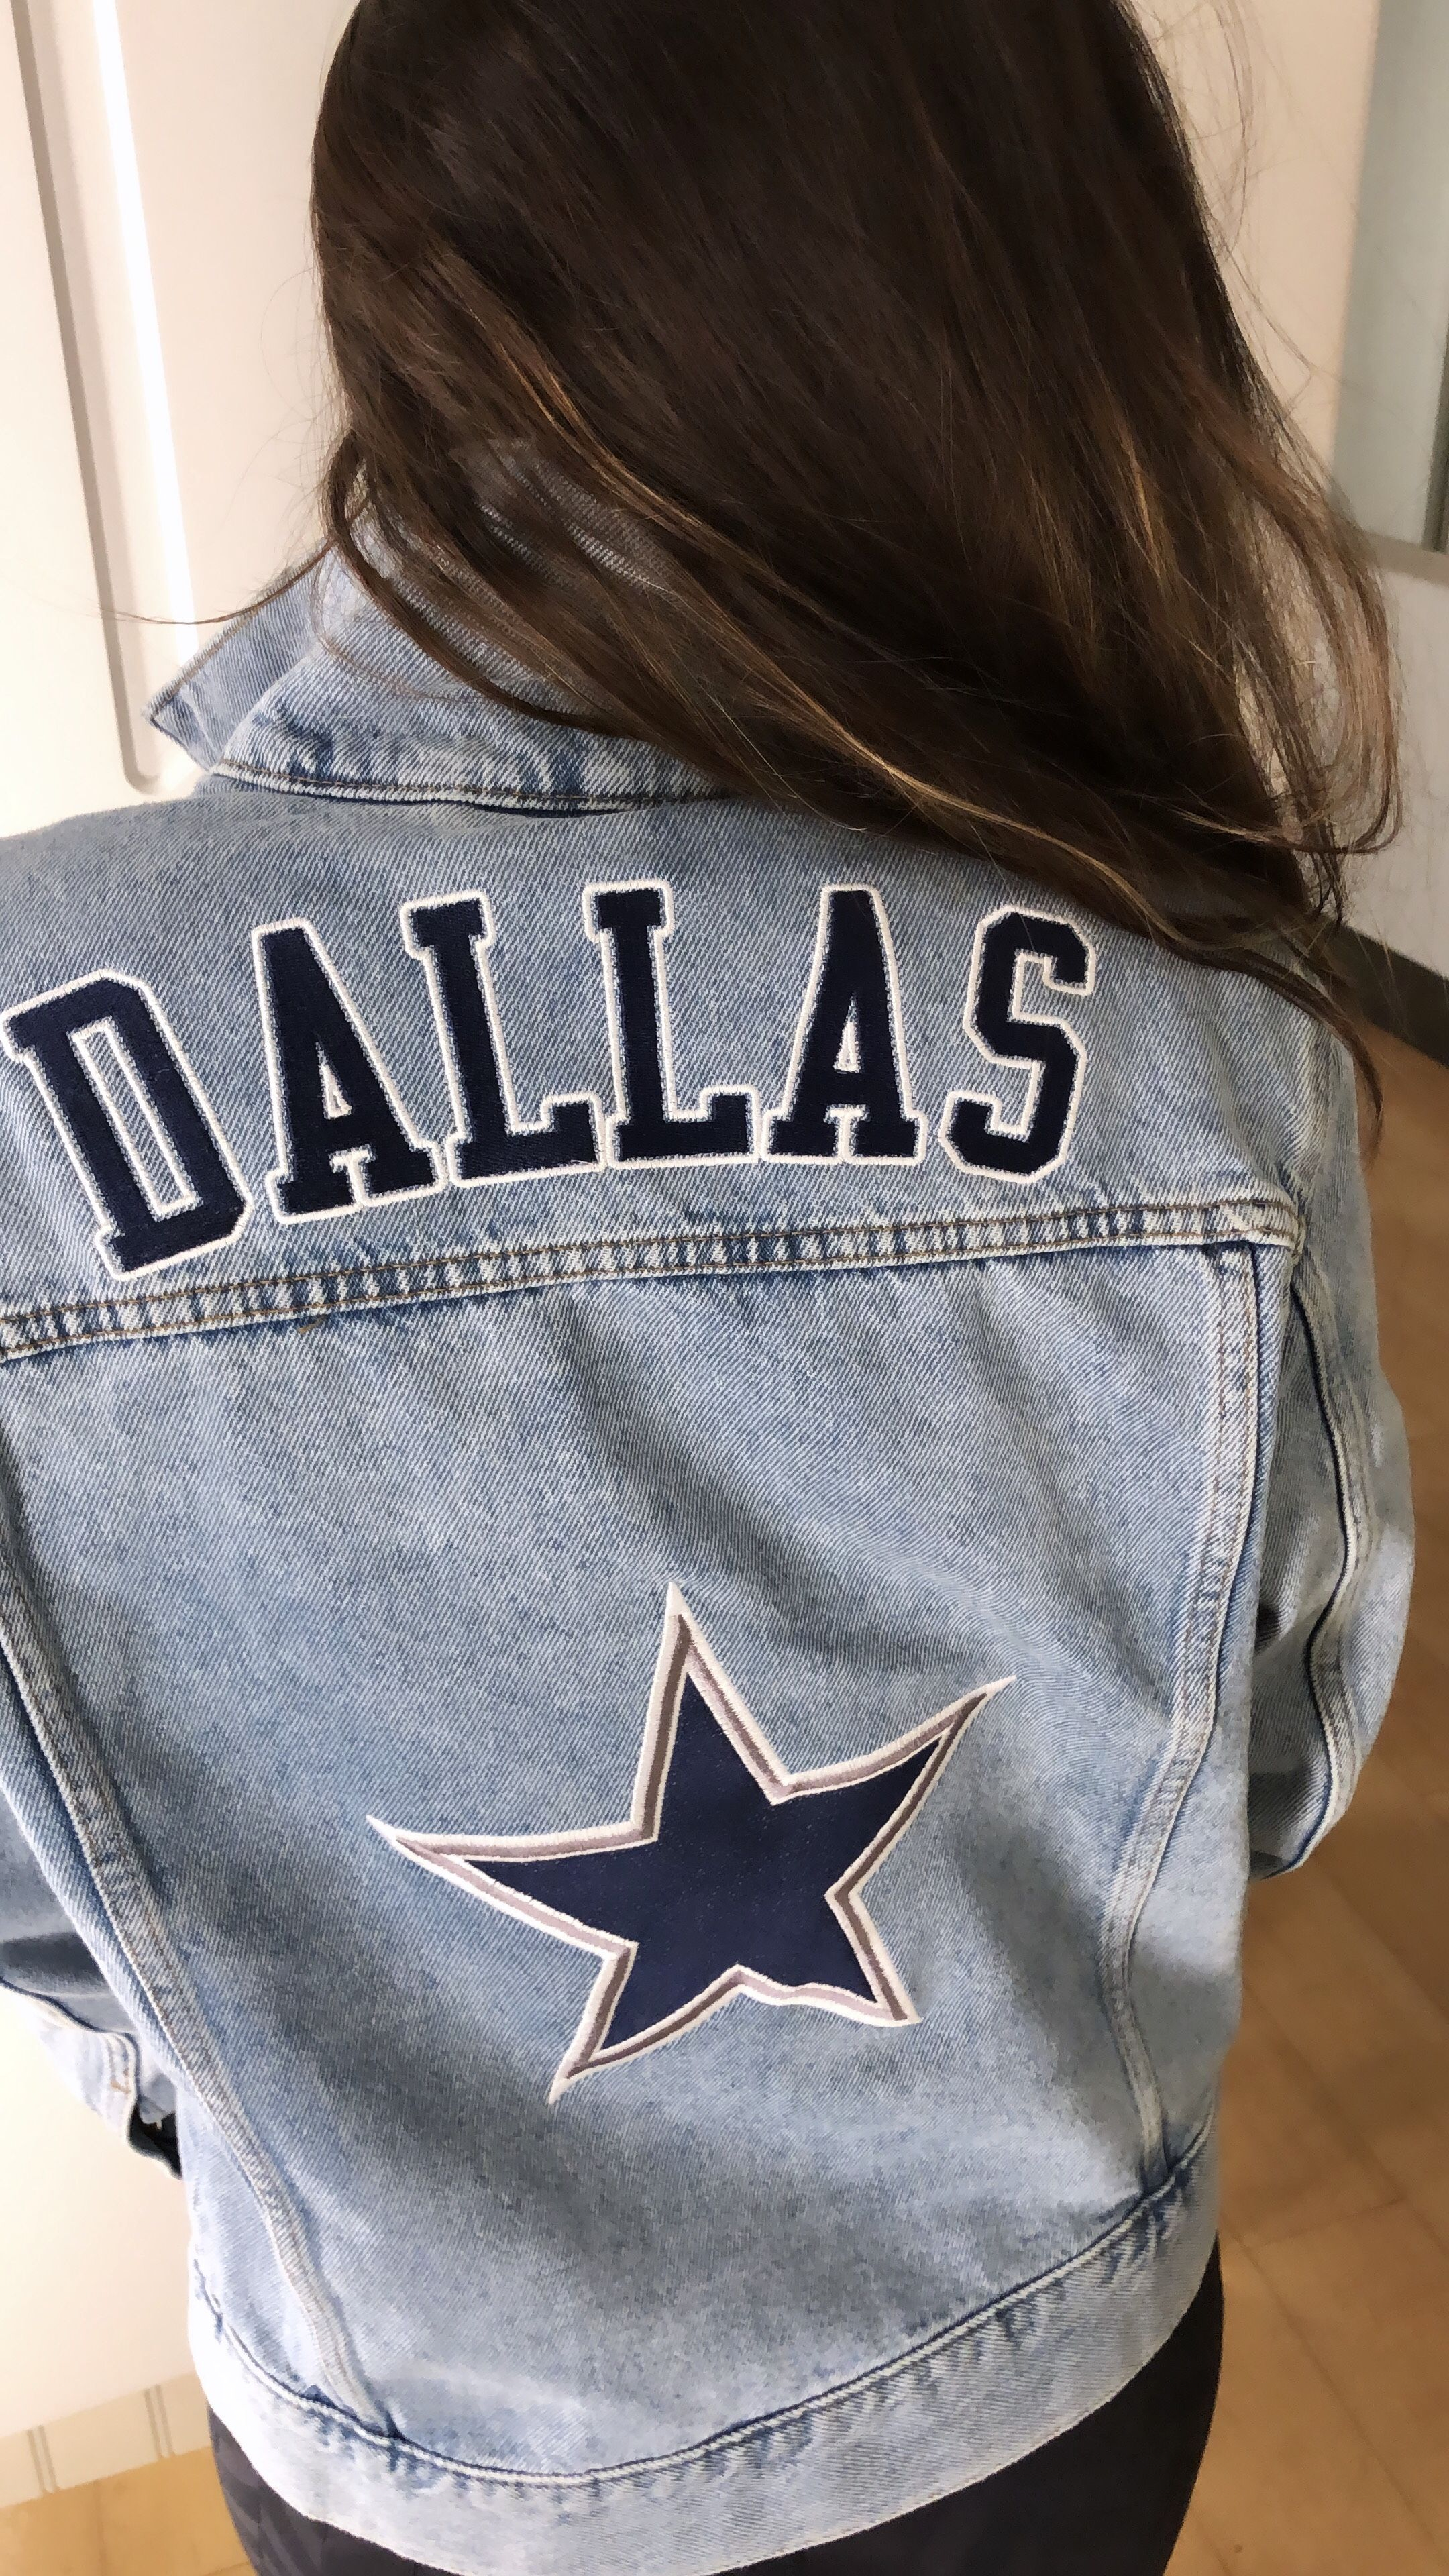 Custom Denim Jackets Dallascowboys Diy Denim Jacket Custom Denim Jackets Custom Denim Jacket [ 3840 x 2160 Pixel ]